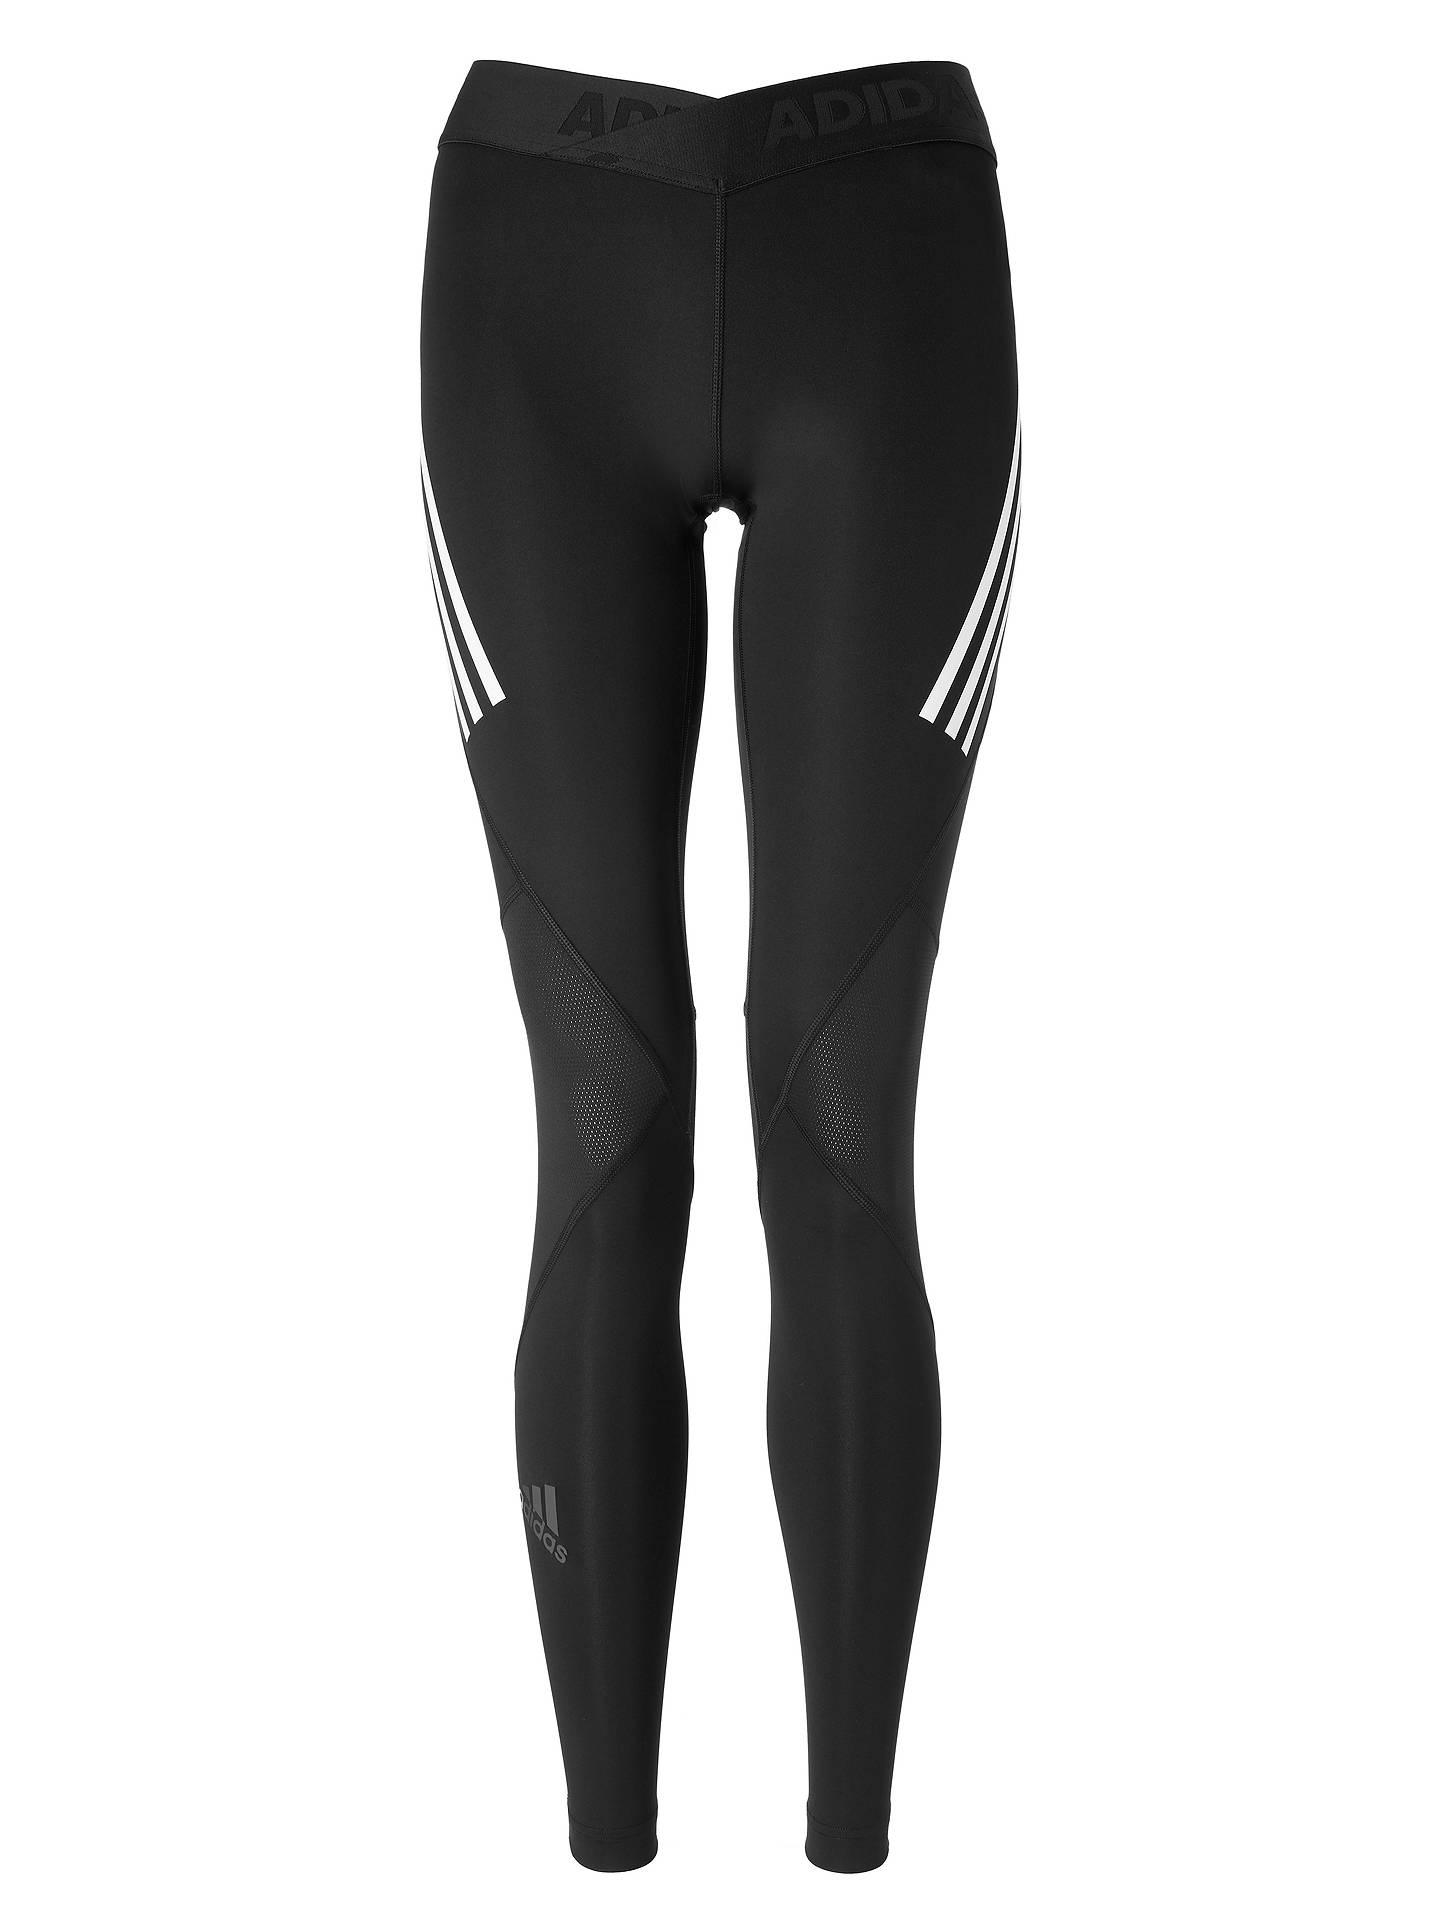 55495116e6f5b ... Buy adidas Alphaskin Sport 3-Stripes Long Training Tights, Black, M  Online at ...